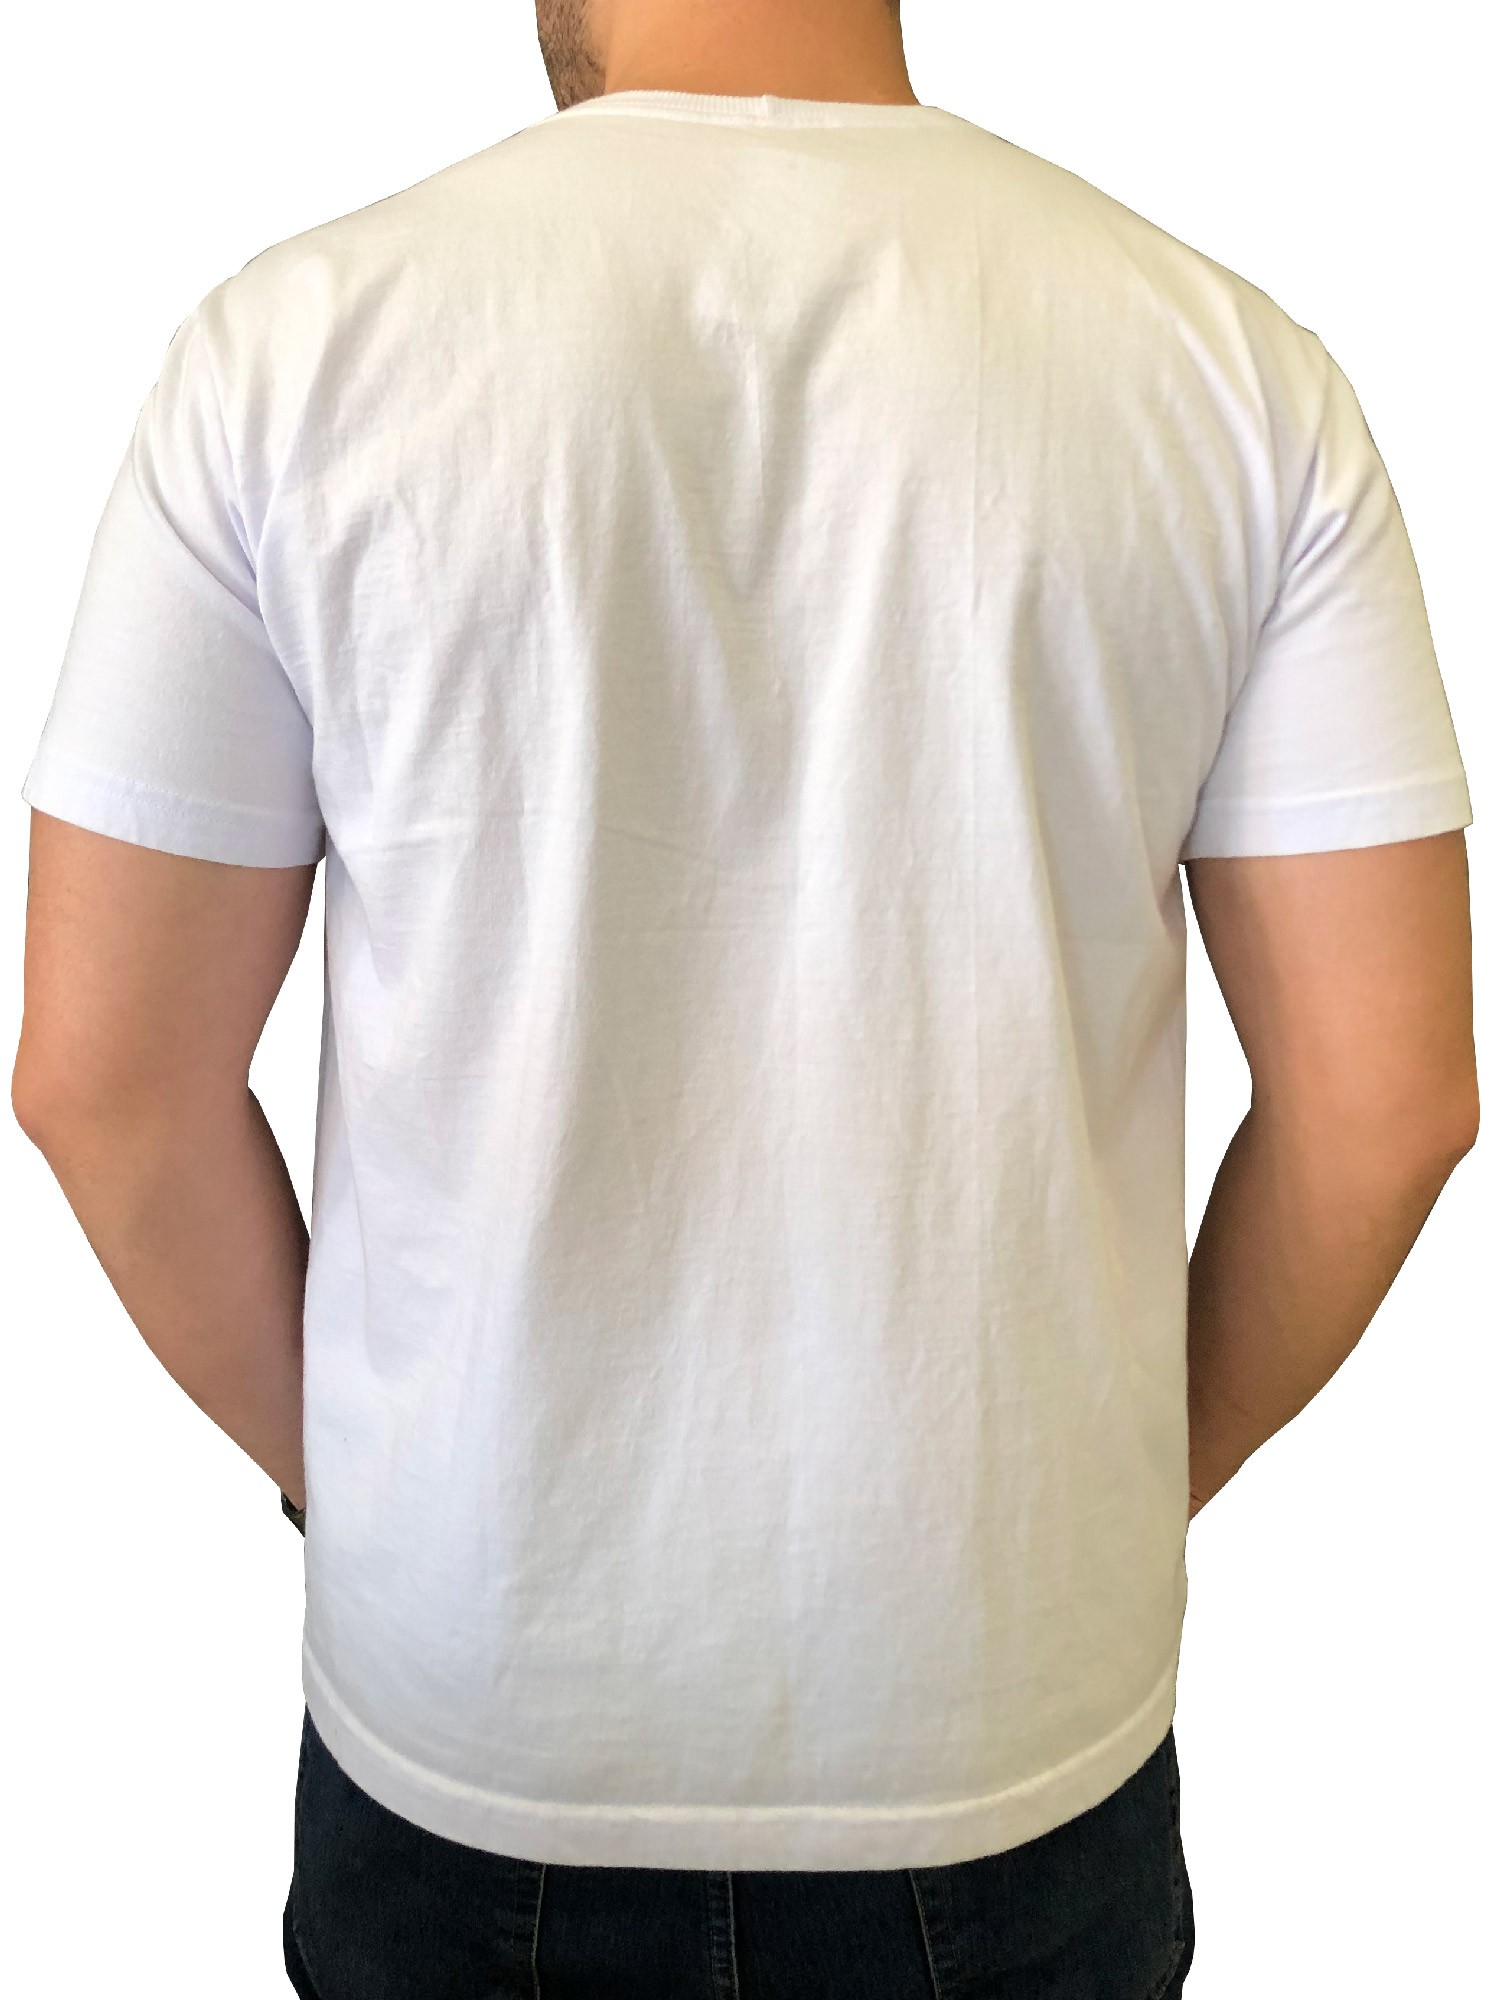 Camiseta Copenhagen U.S.A Branca